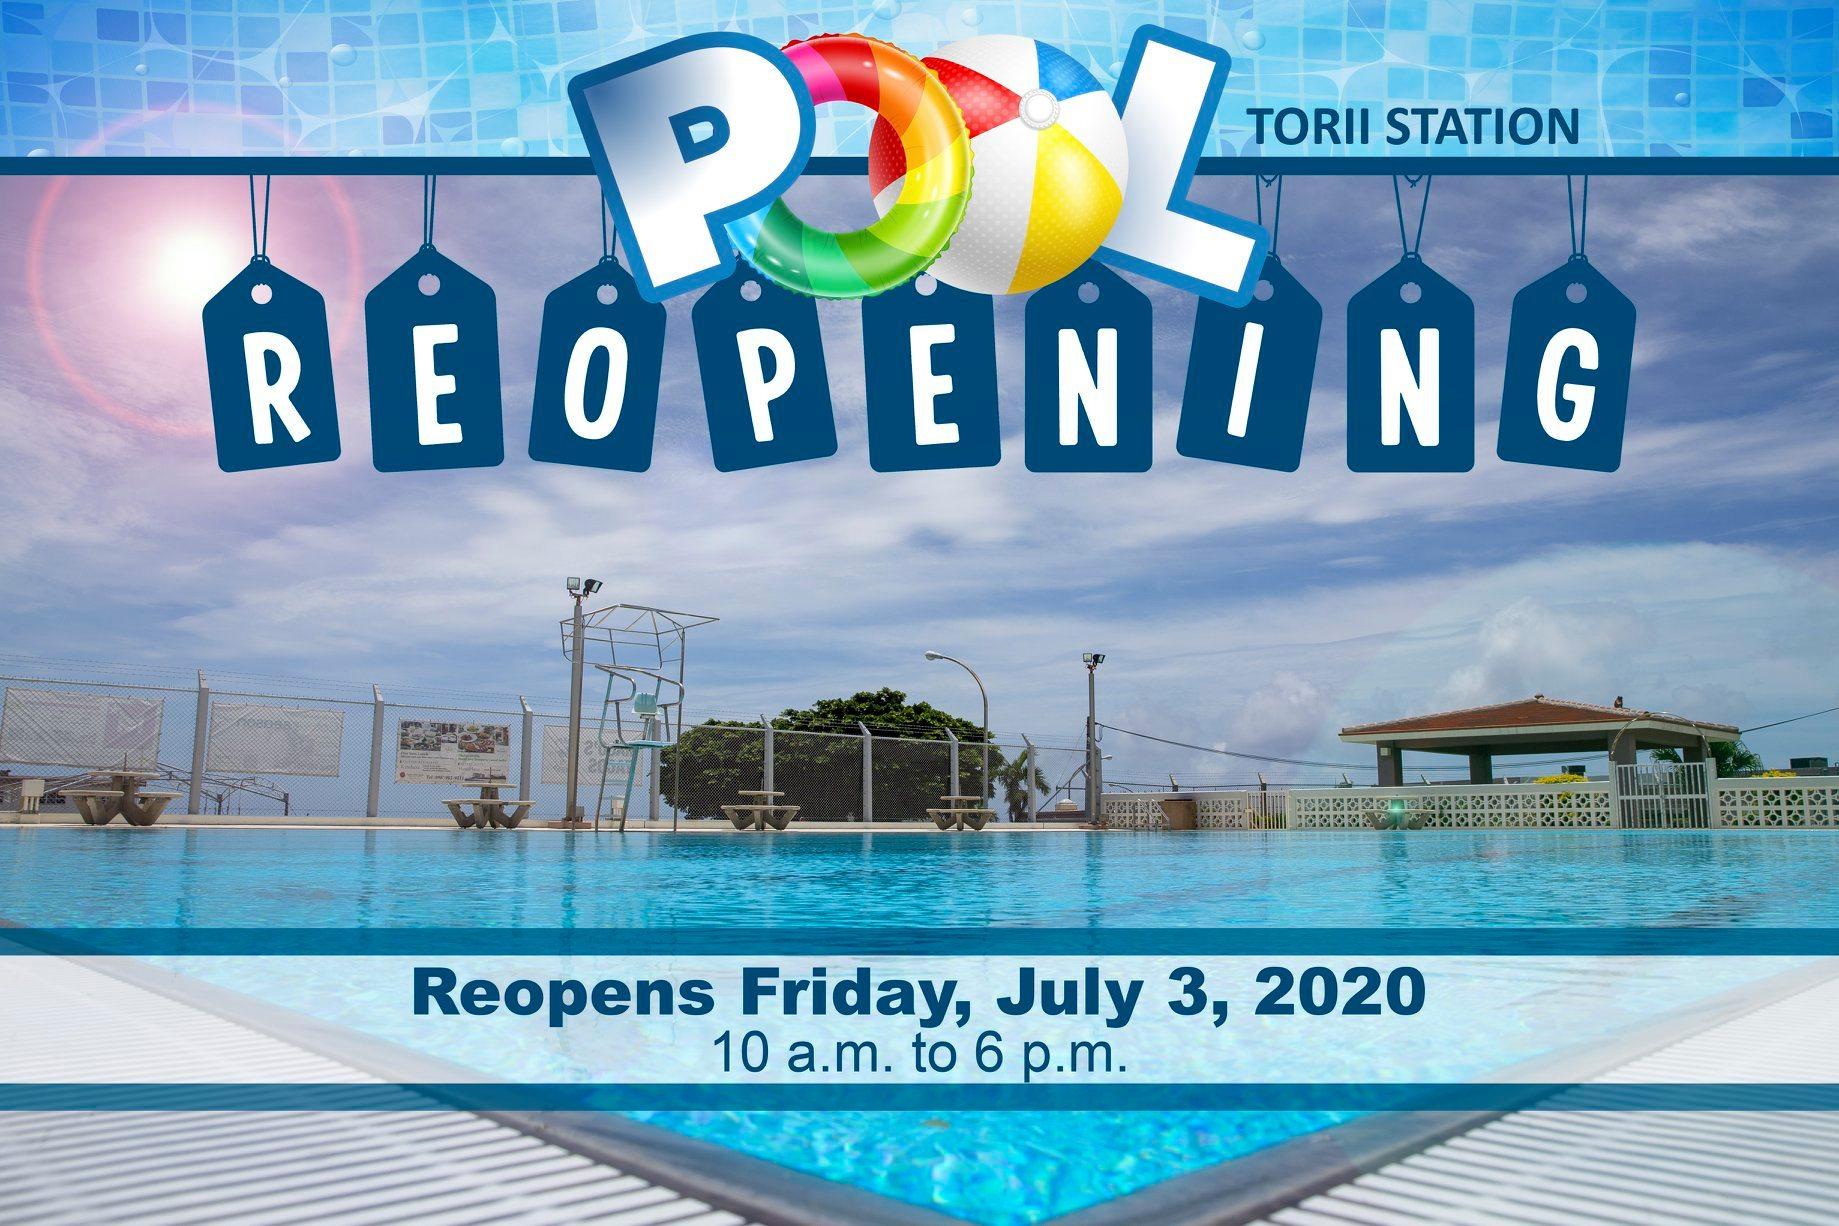 Torii Pool Open Friday, July 3